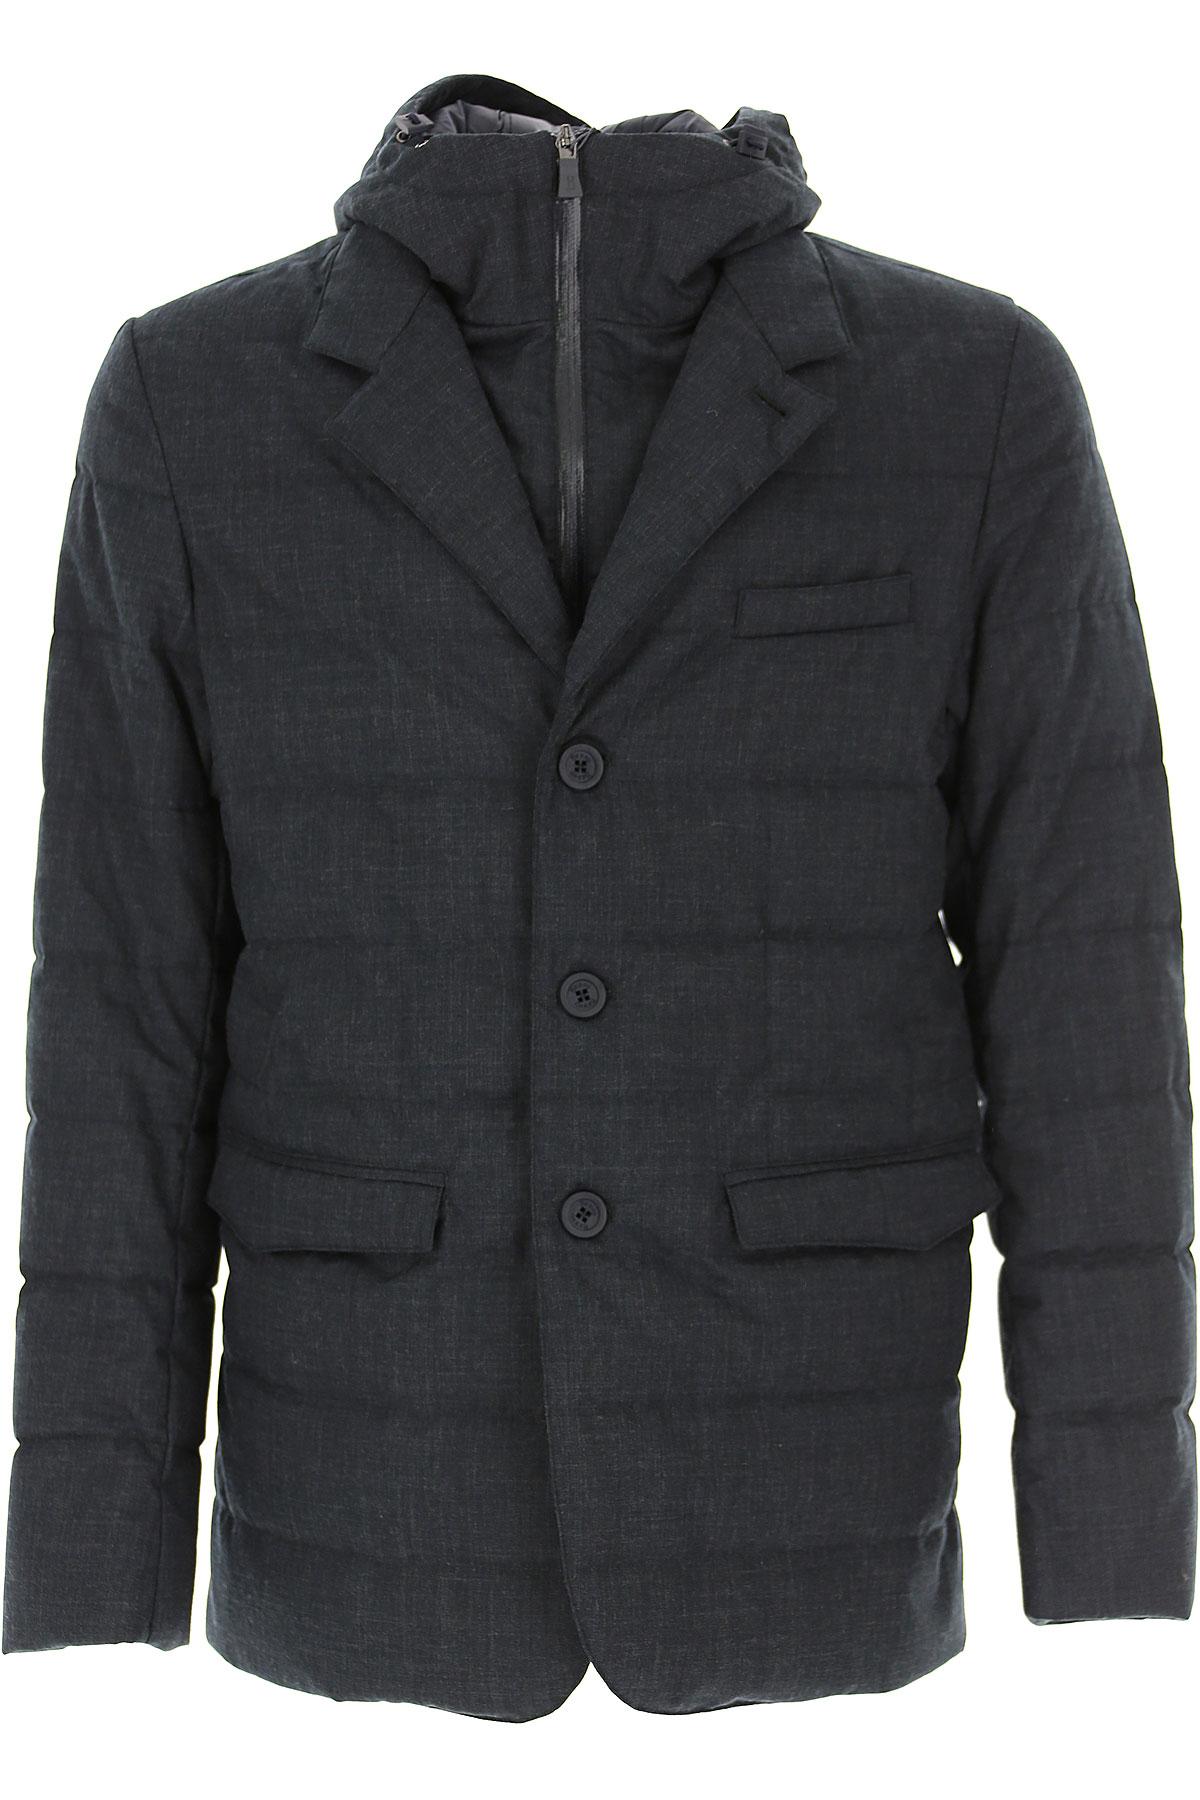 Herno Down Jacket for Men, Puffer Ski Jacket On Sale, Ocean Blue, Down, 2019, L M XL XXXL